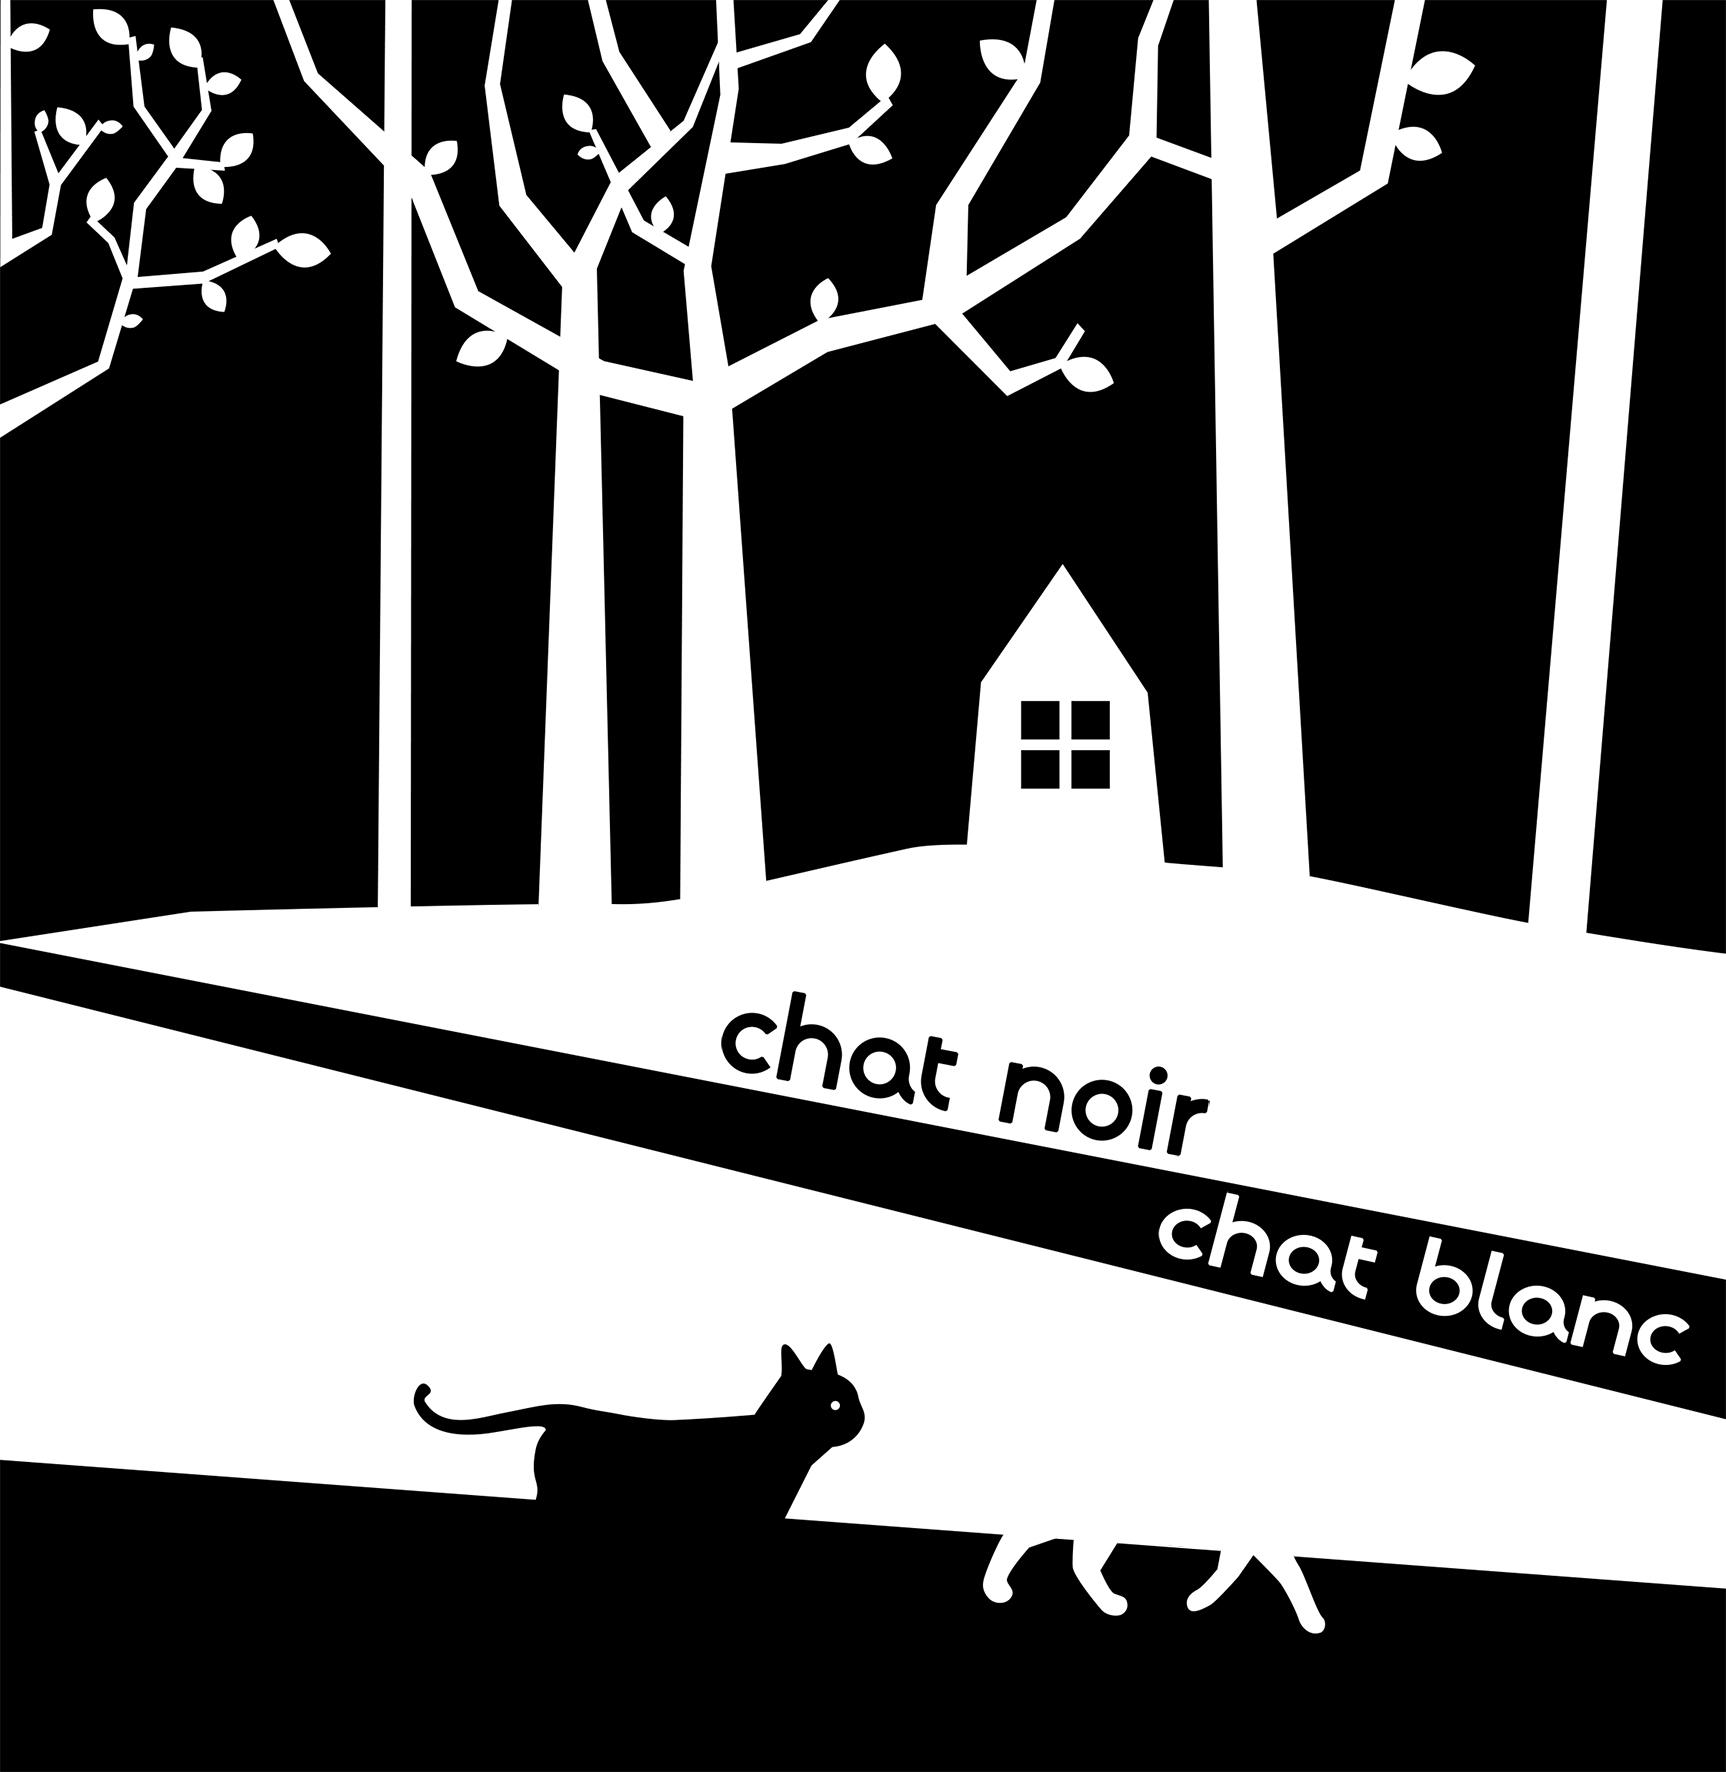 19 10 16 chatnoirchatblanc